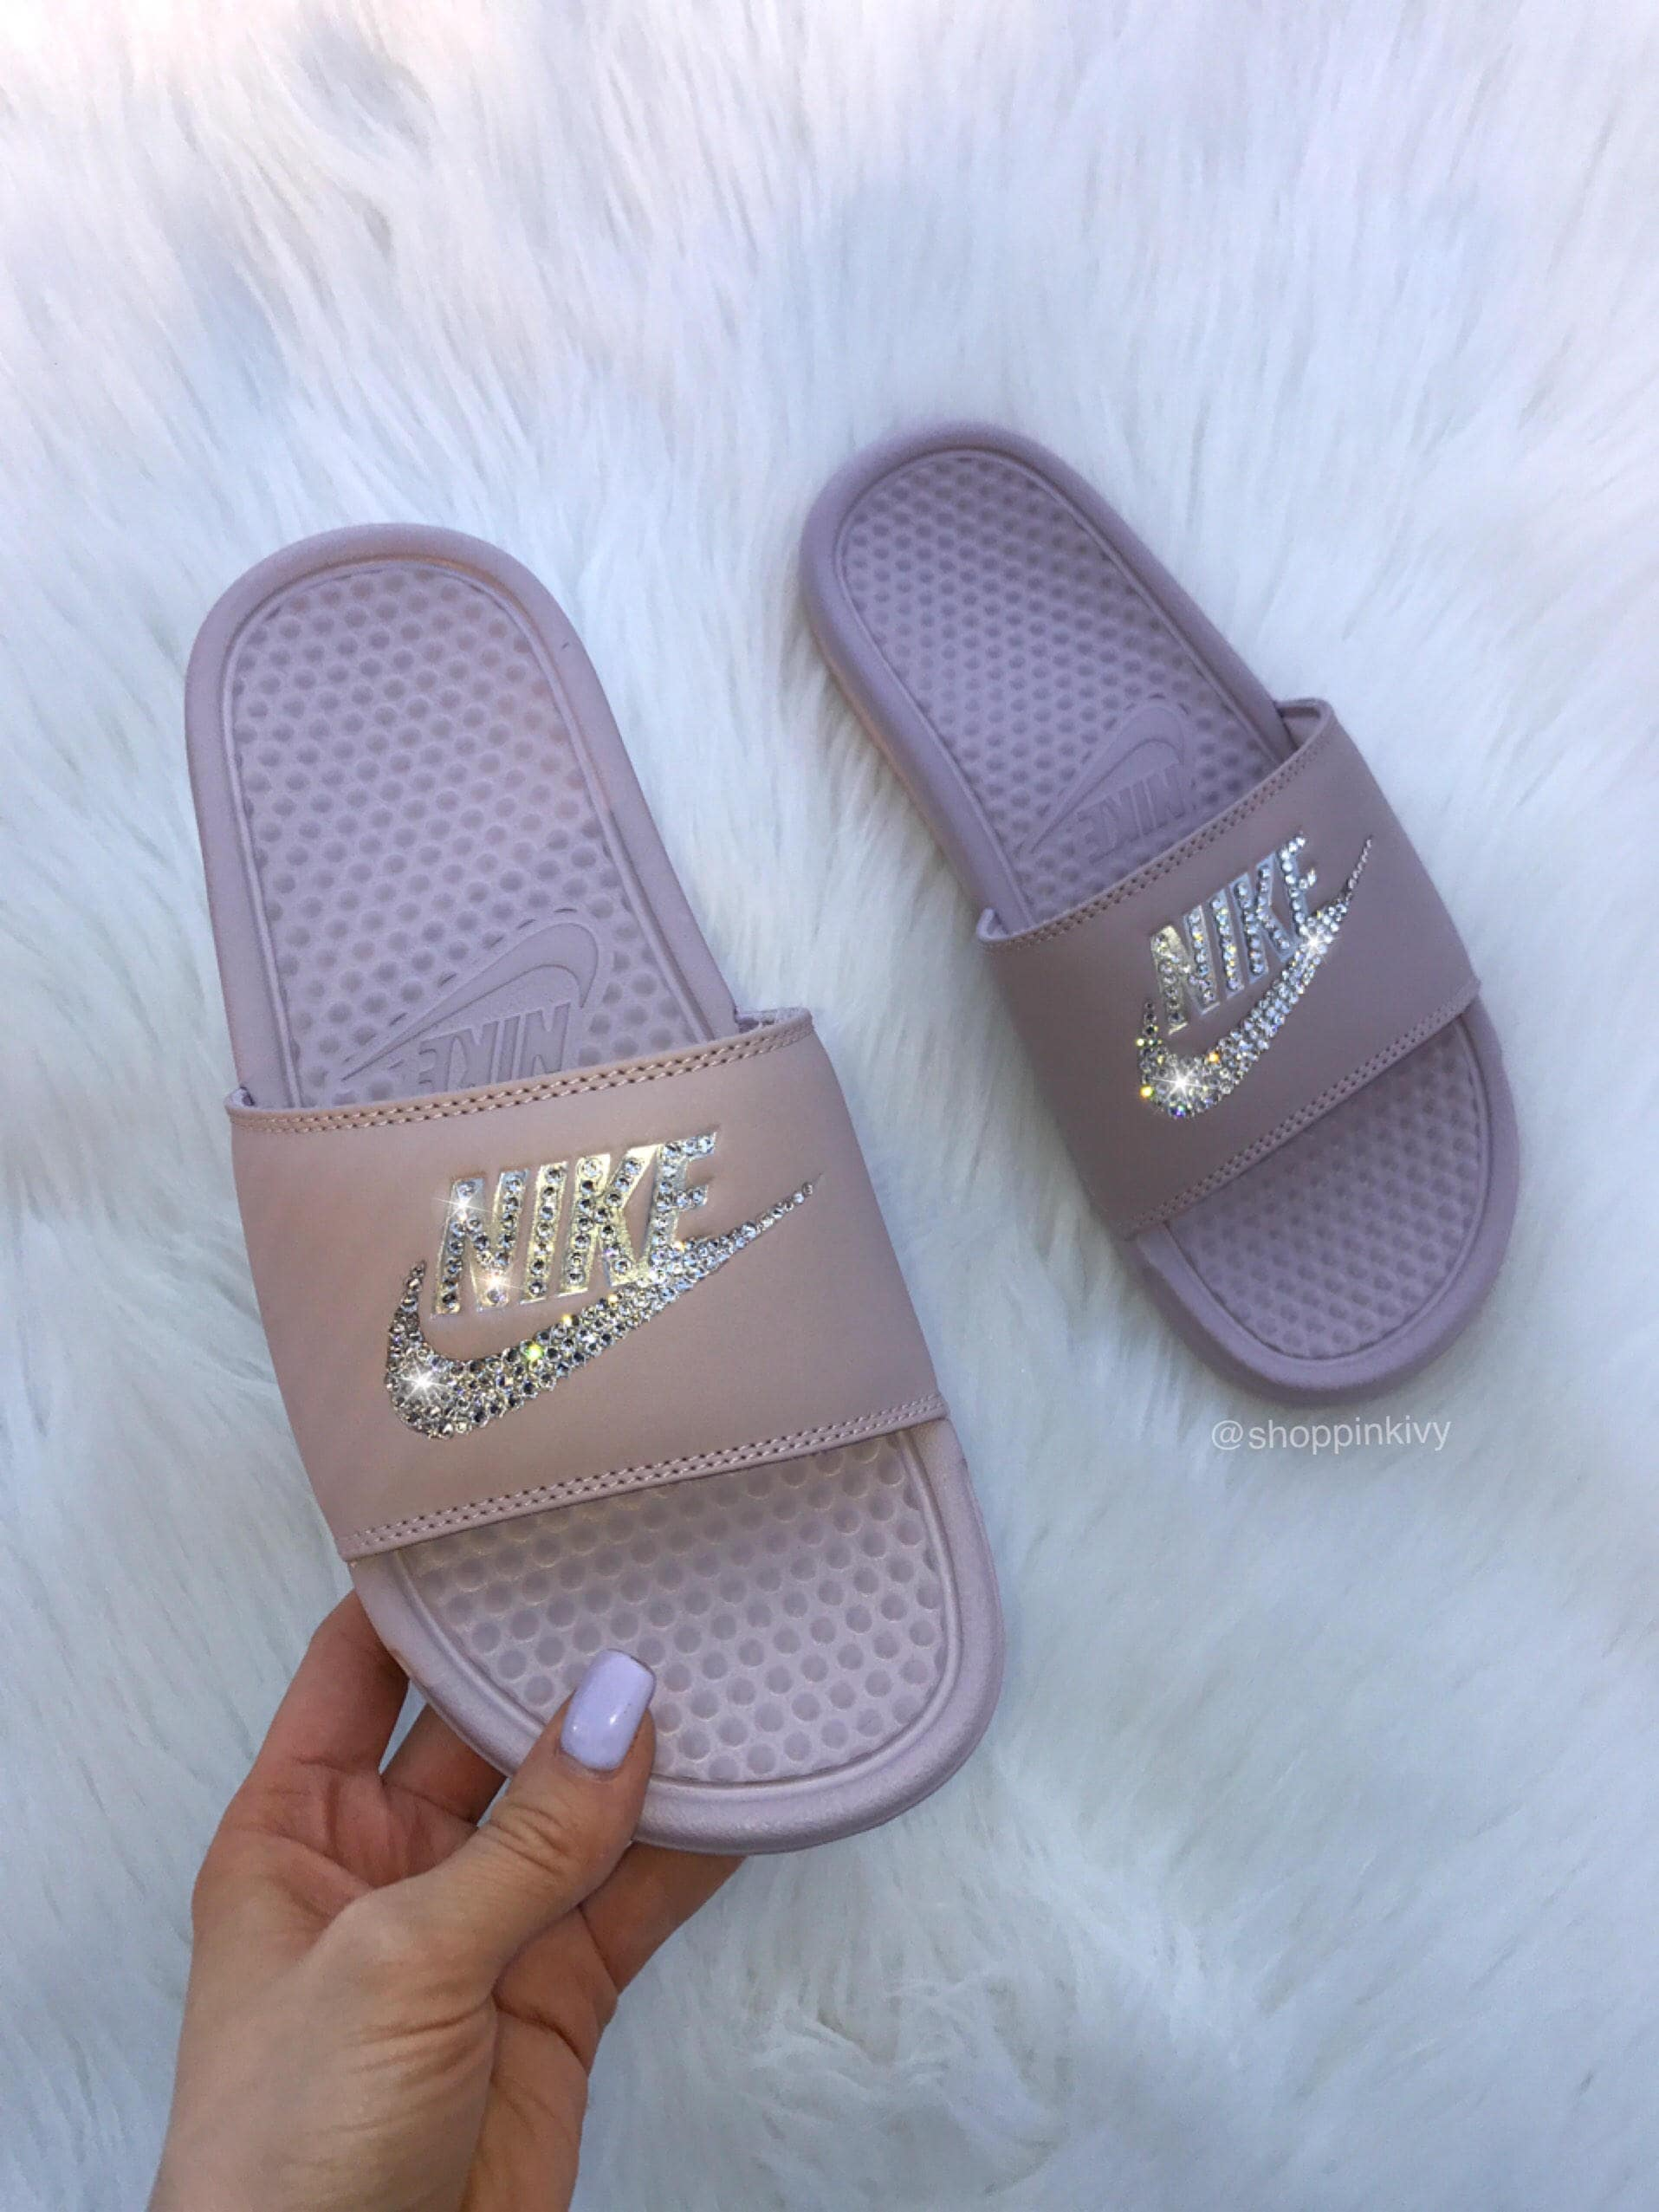 9170682f1b4 Women s Swarovski Nike Benassi Slide Sandals customized